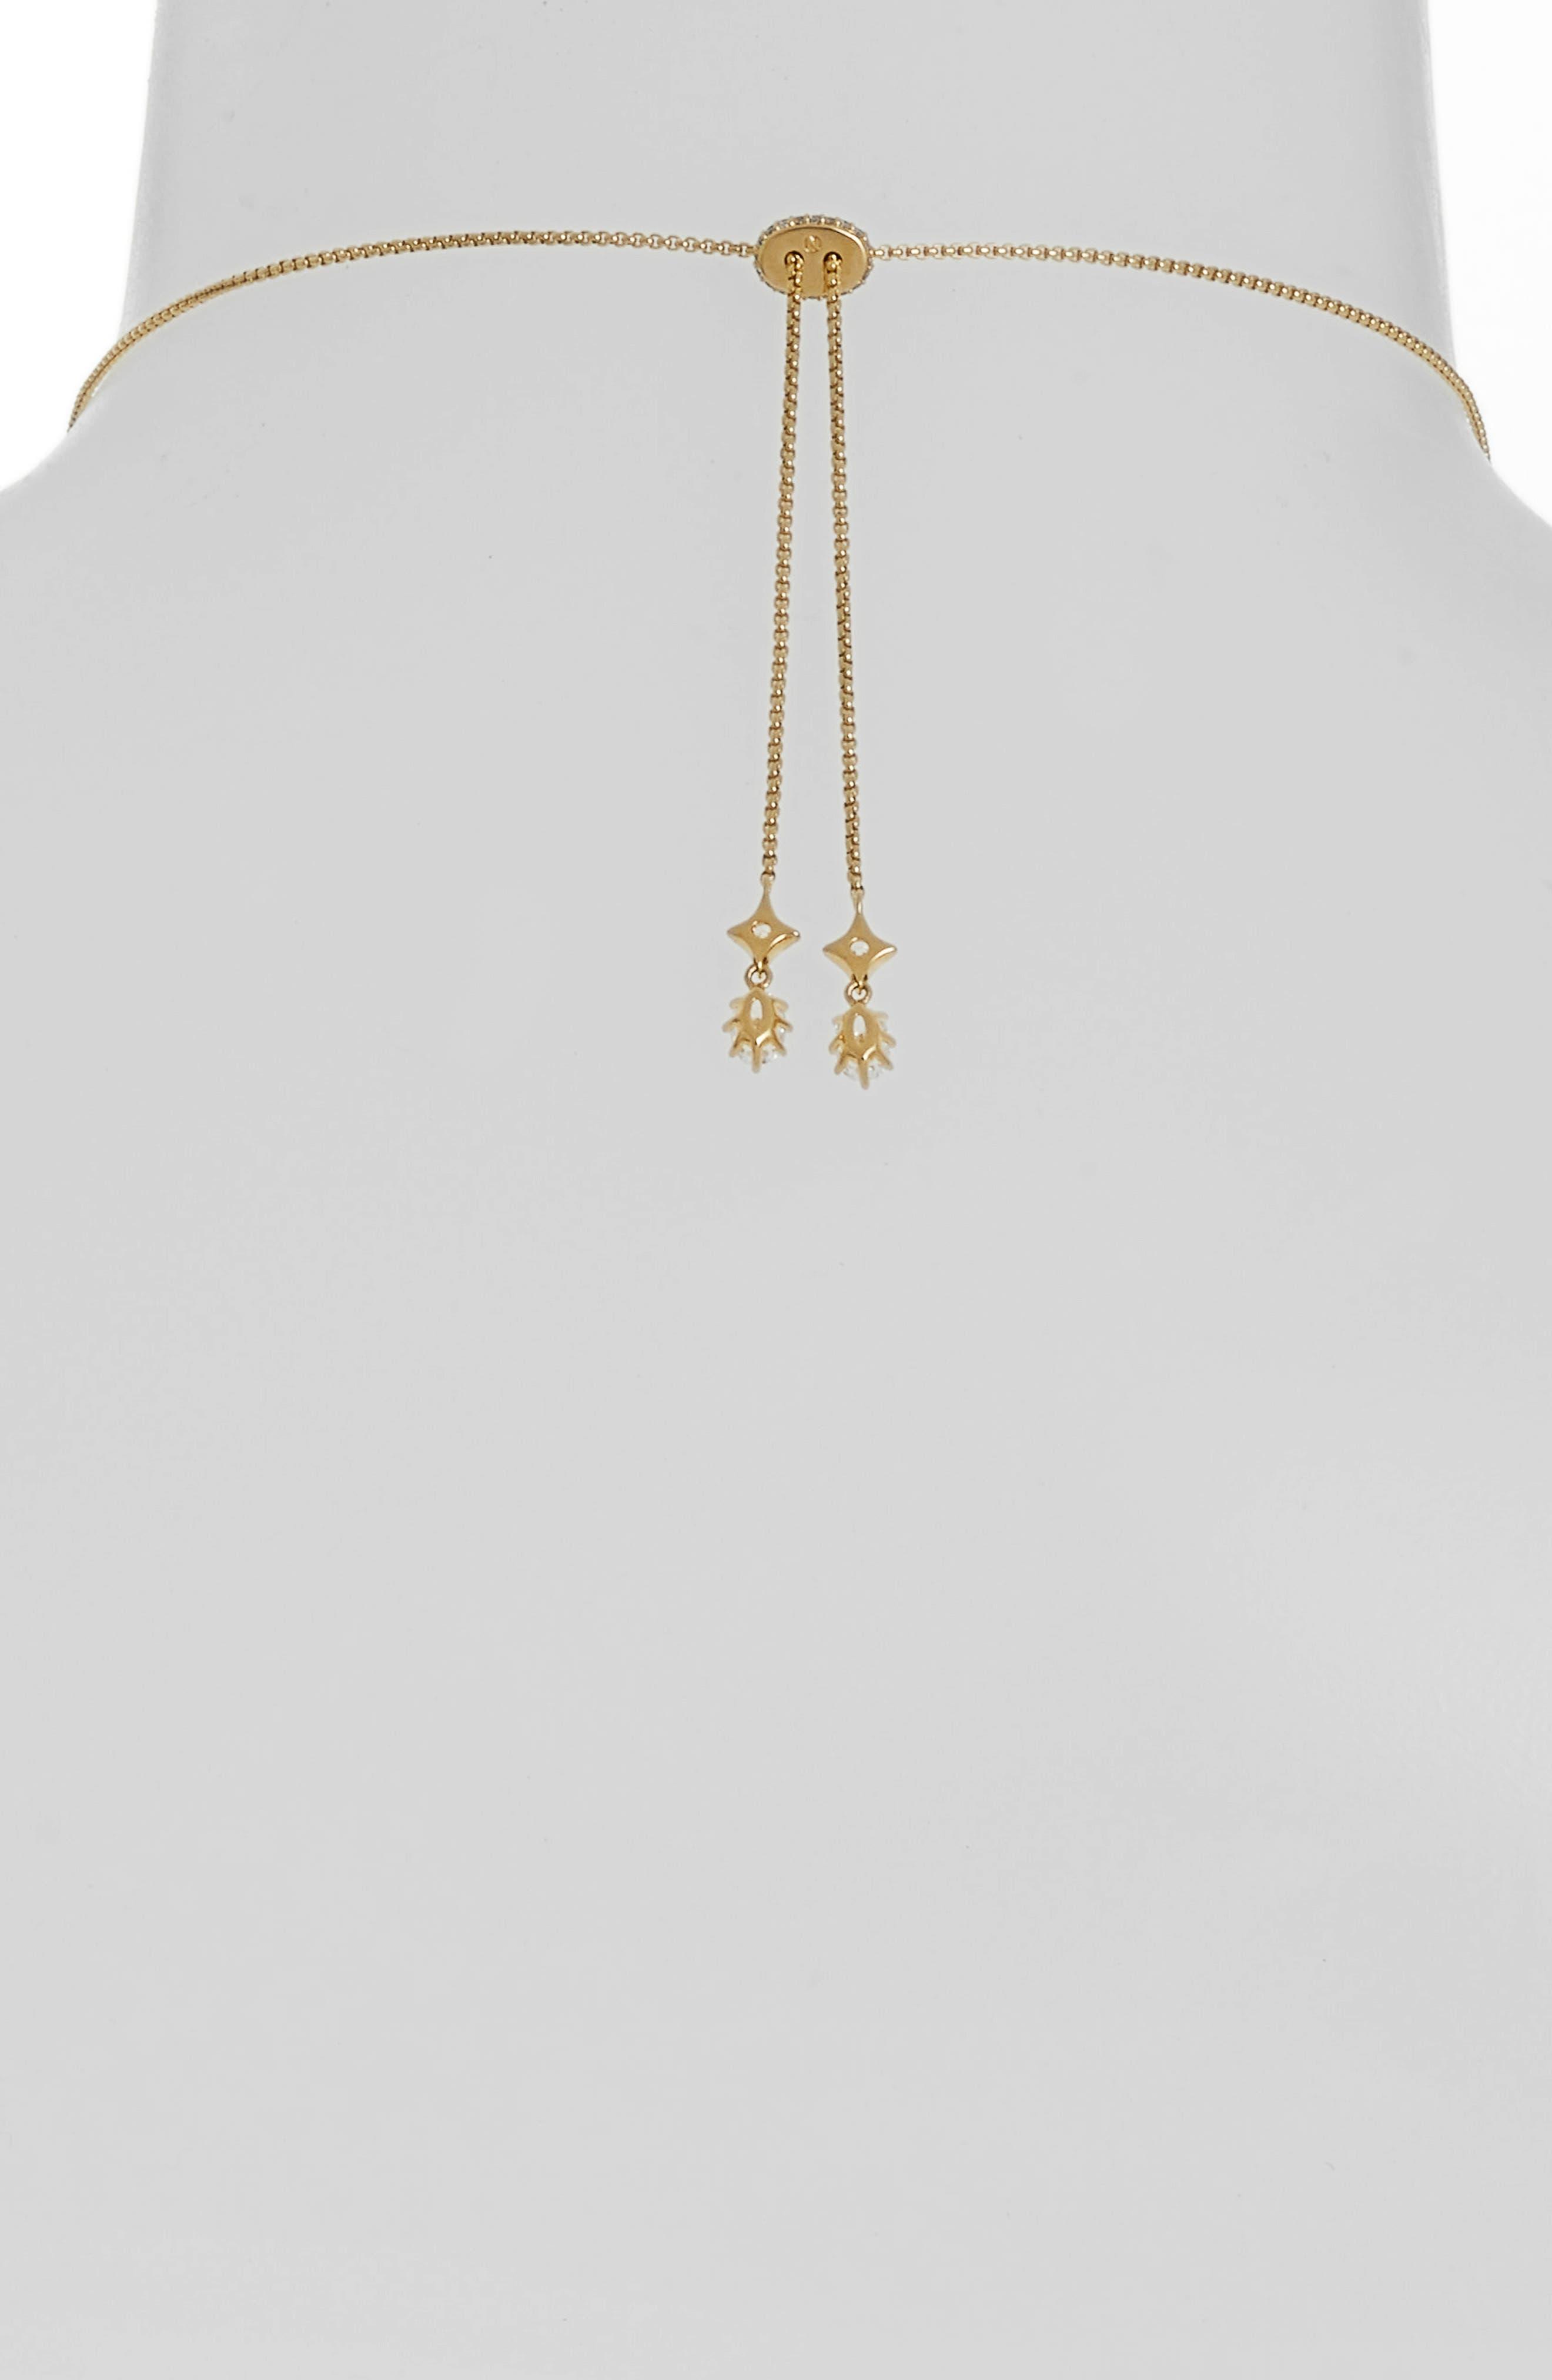 Crystal Fringe Necklace,                             Alternate thumbnail 3, color,                             GOLD/ CLEAR